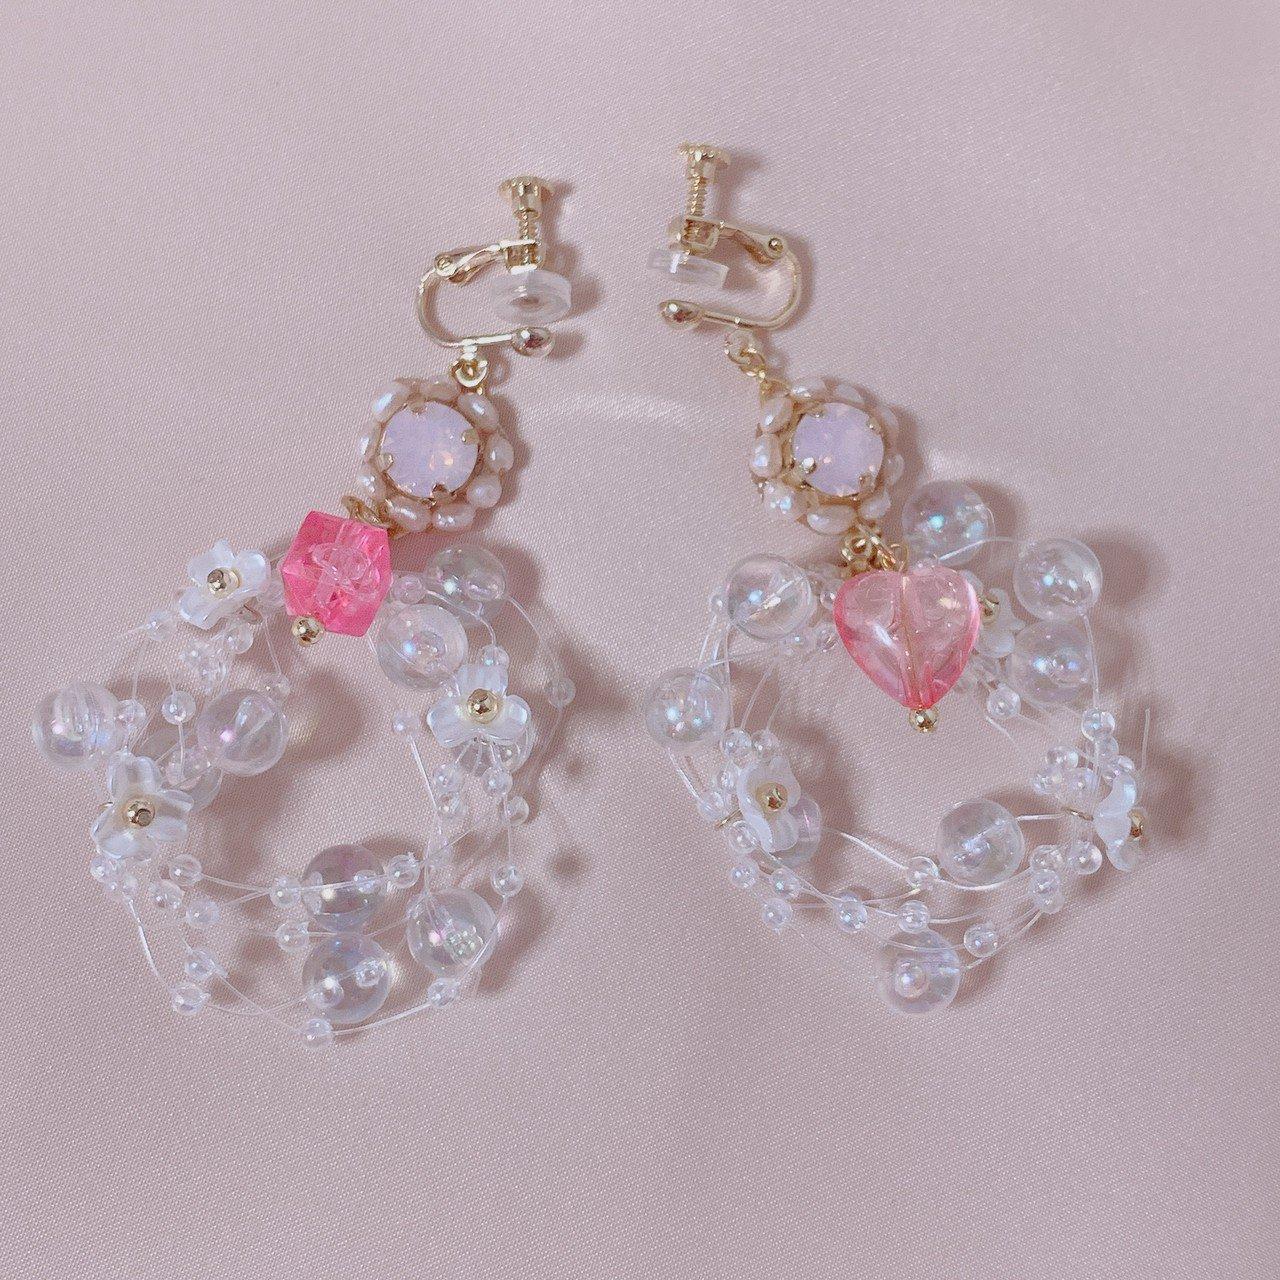 "mimi × tvm ""vintage parts earring"" シャボンカラースワロフスキー(ピンク)"